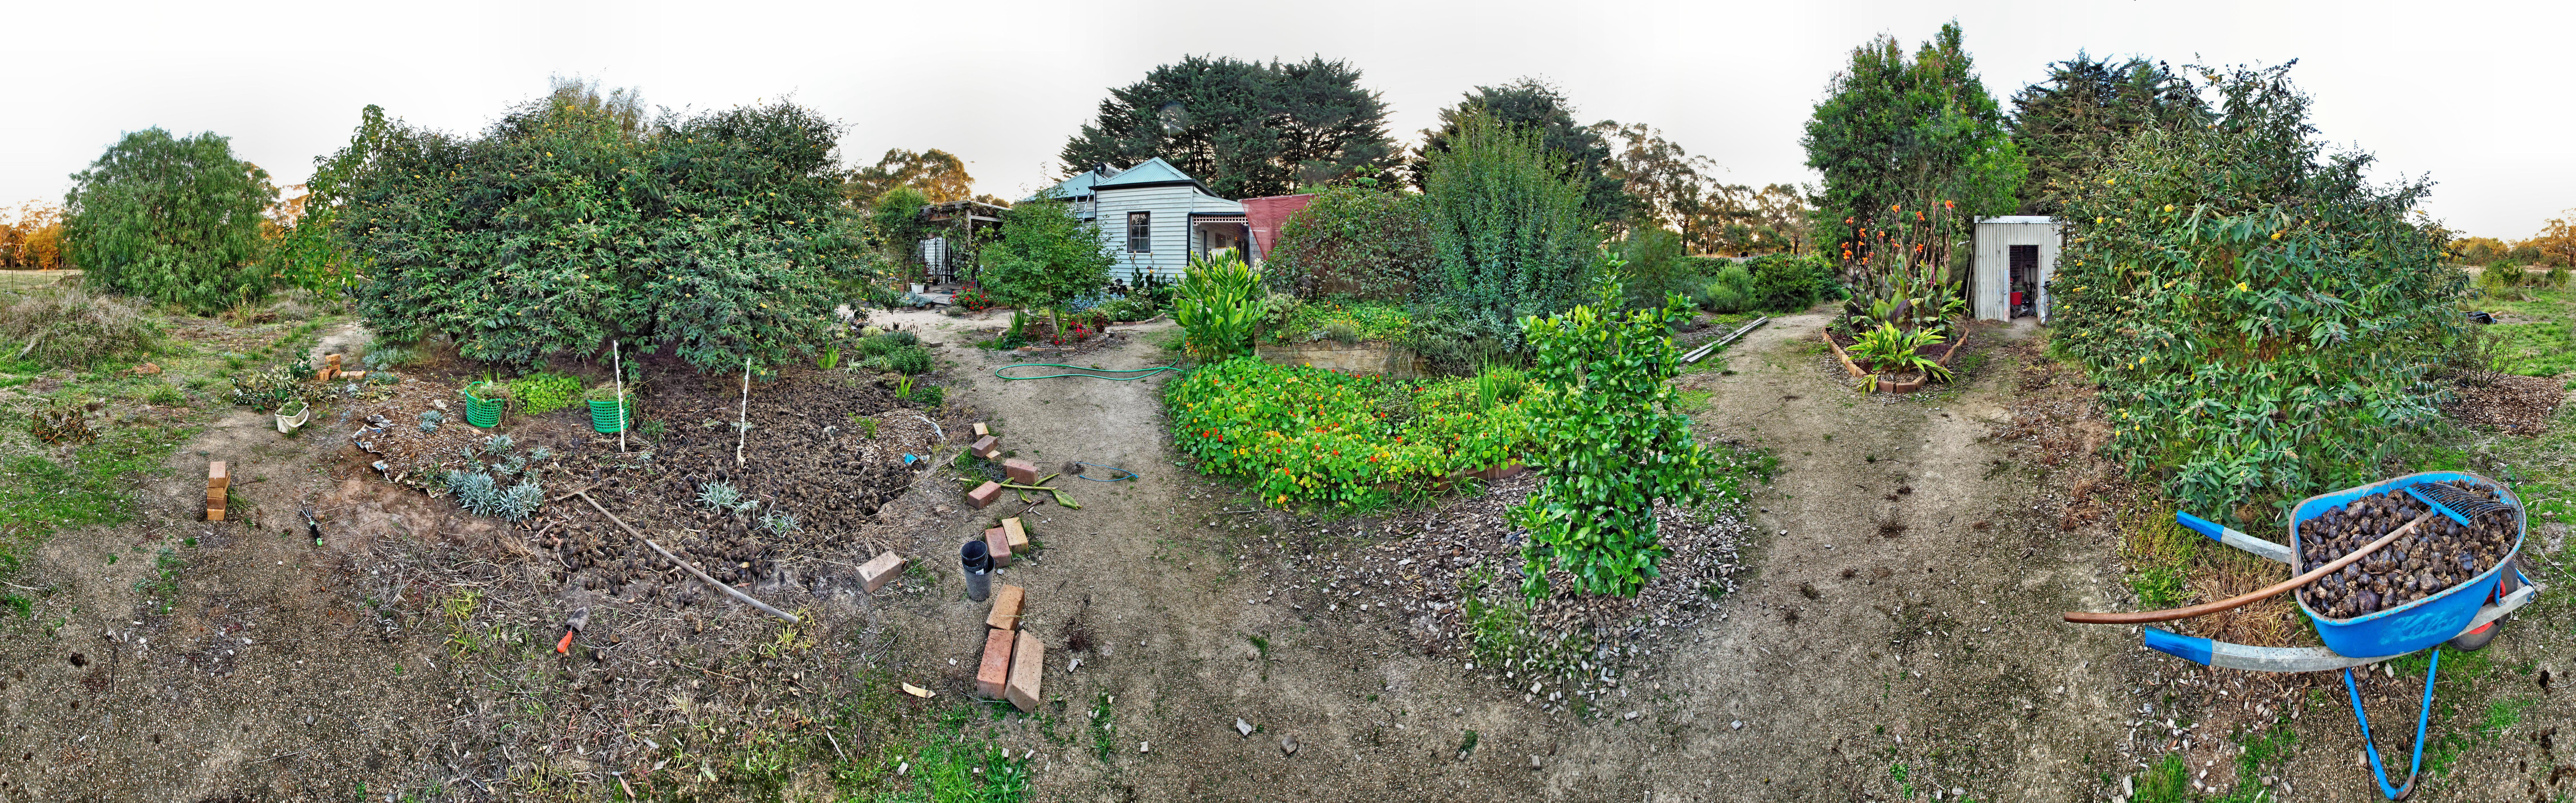 garden-path-ne-ligher.jpeg